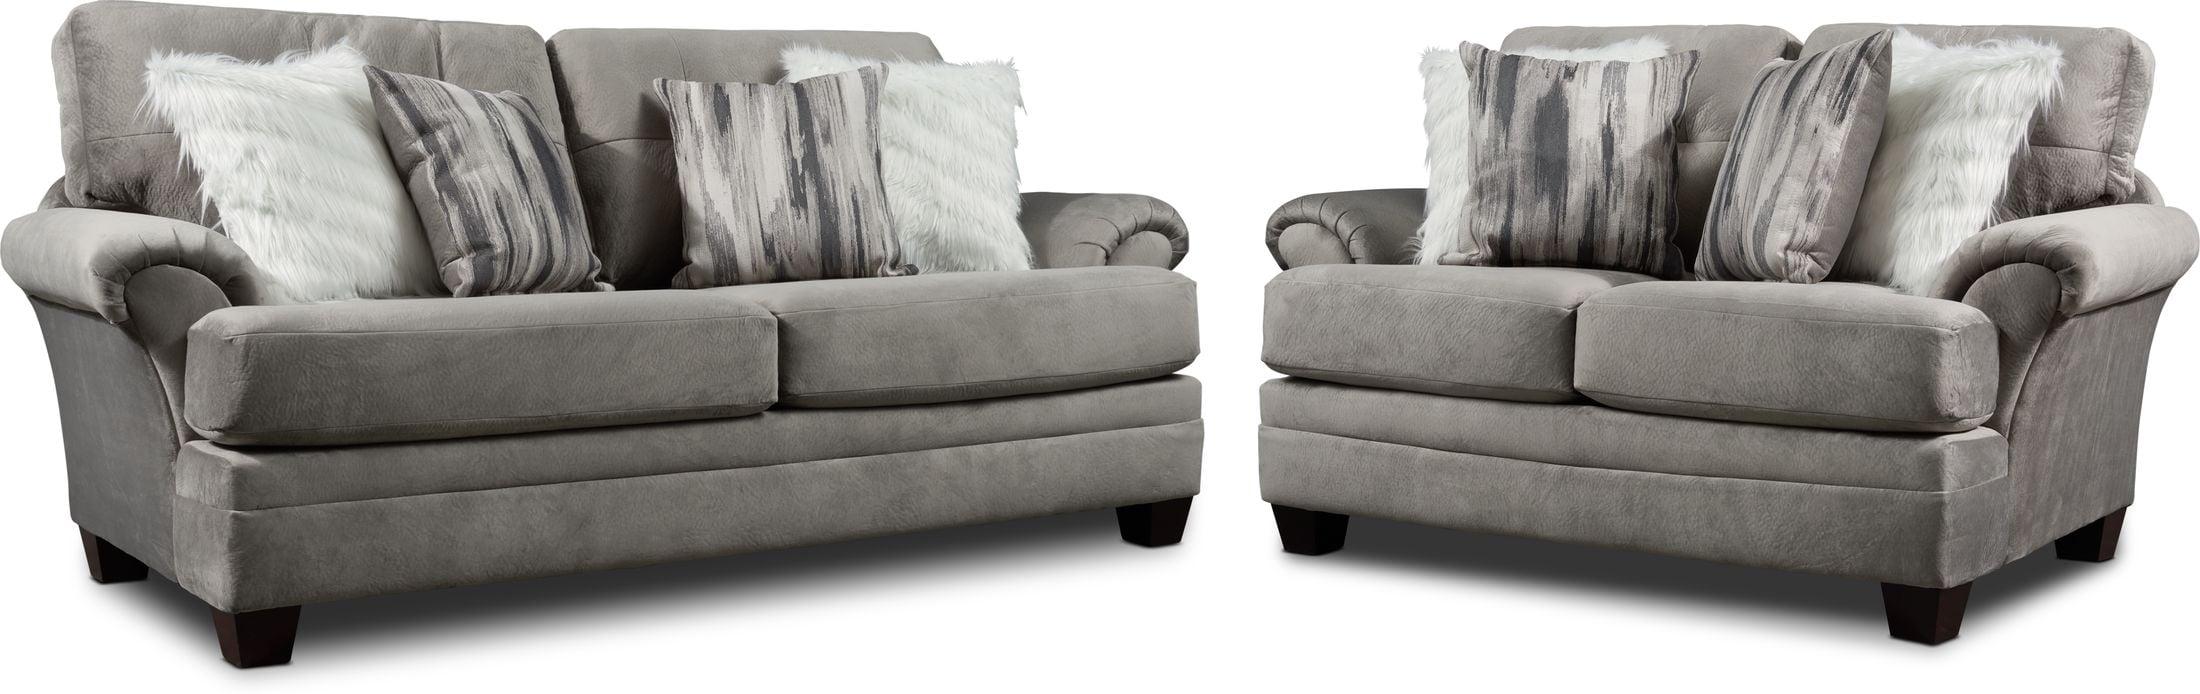 Living Room Furniture - Cordelle Sofa and Loveseat Set